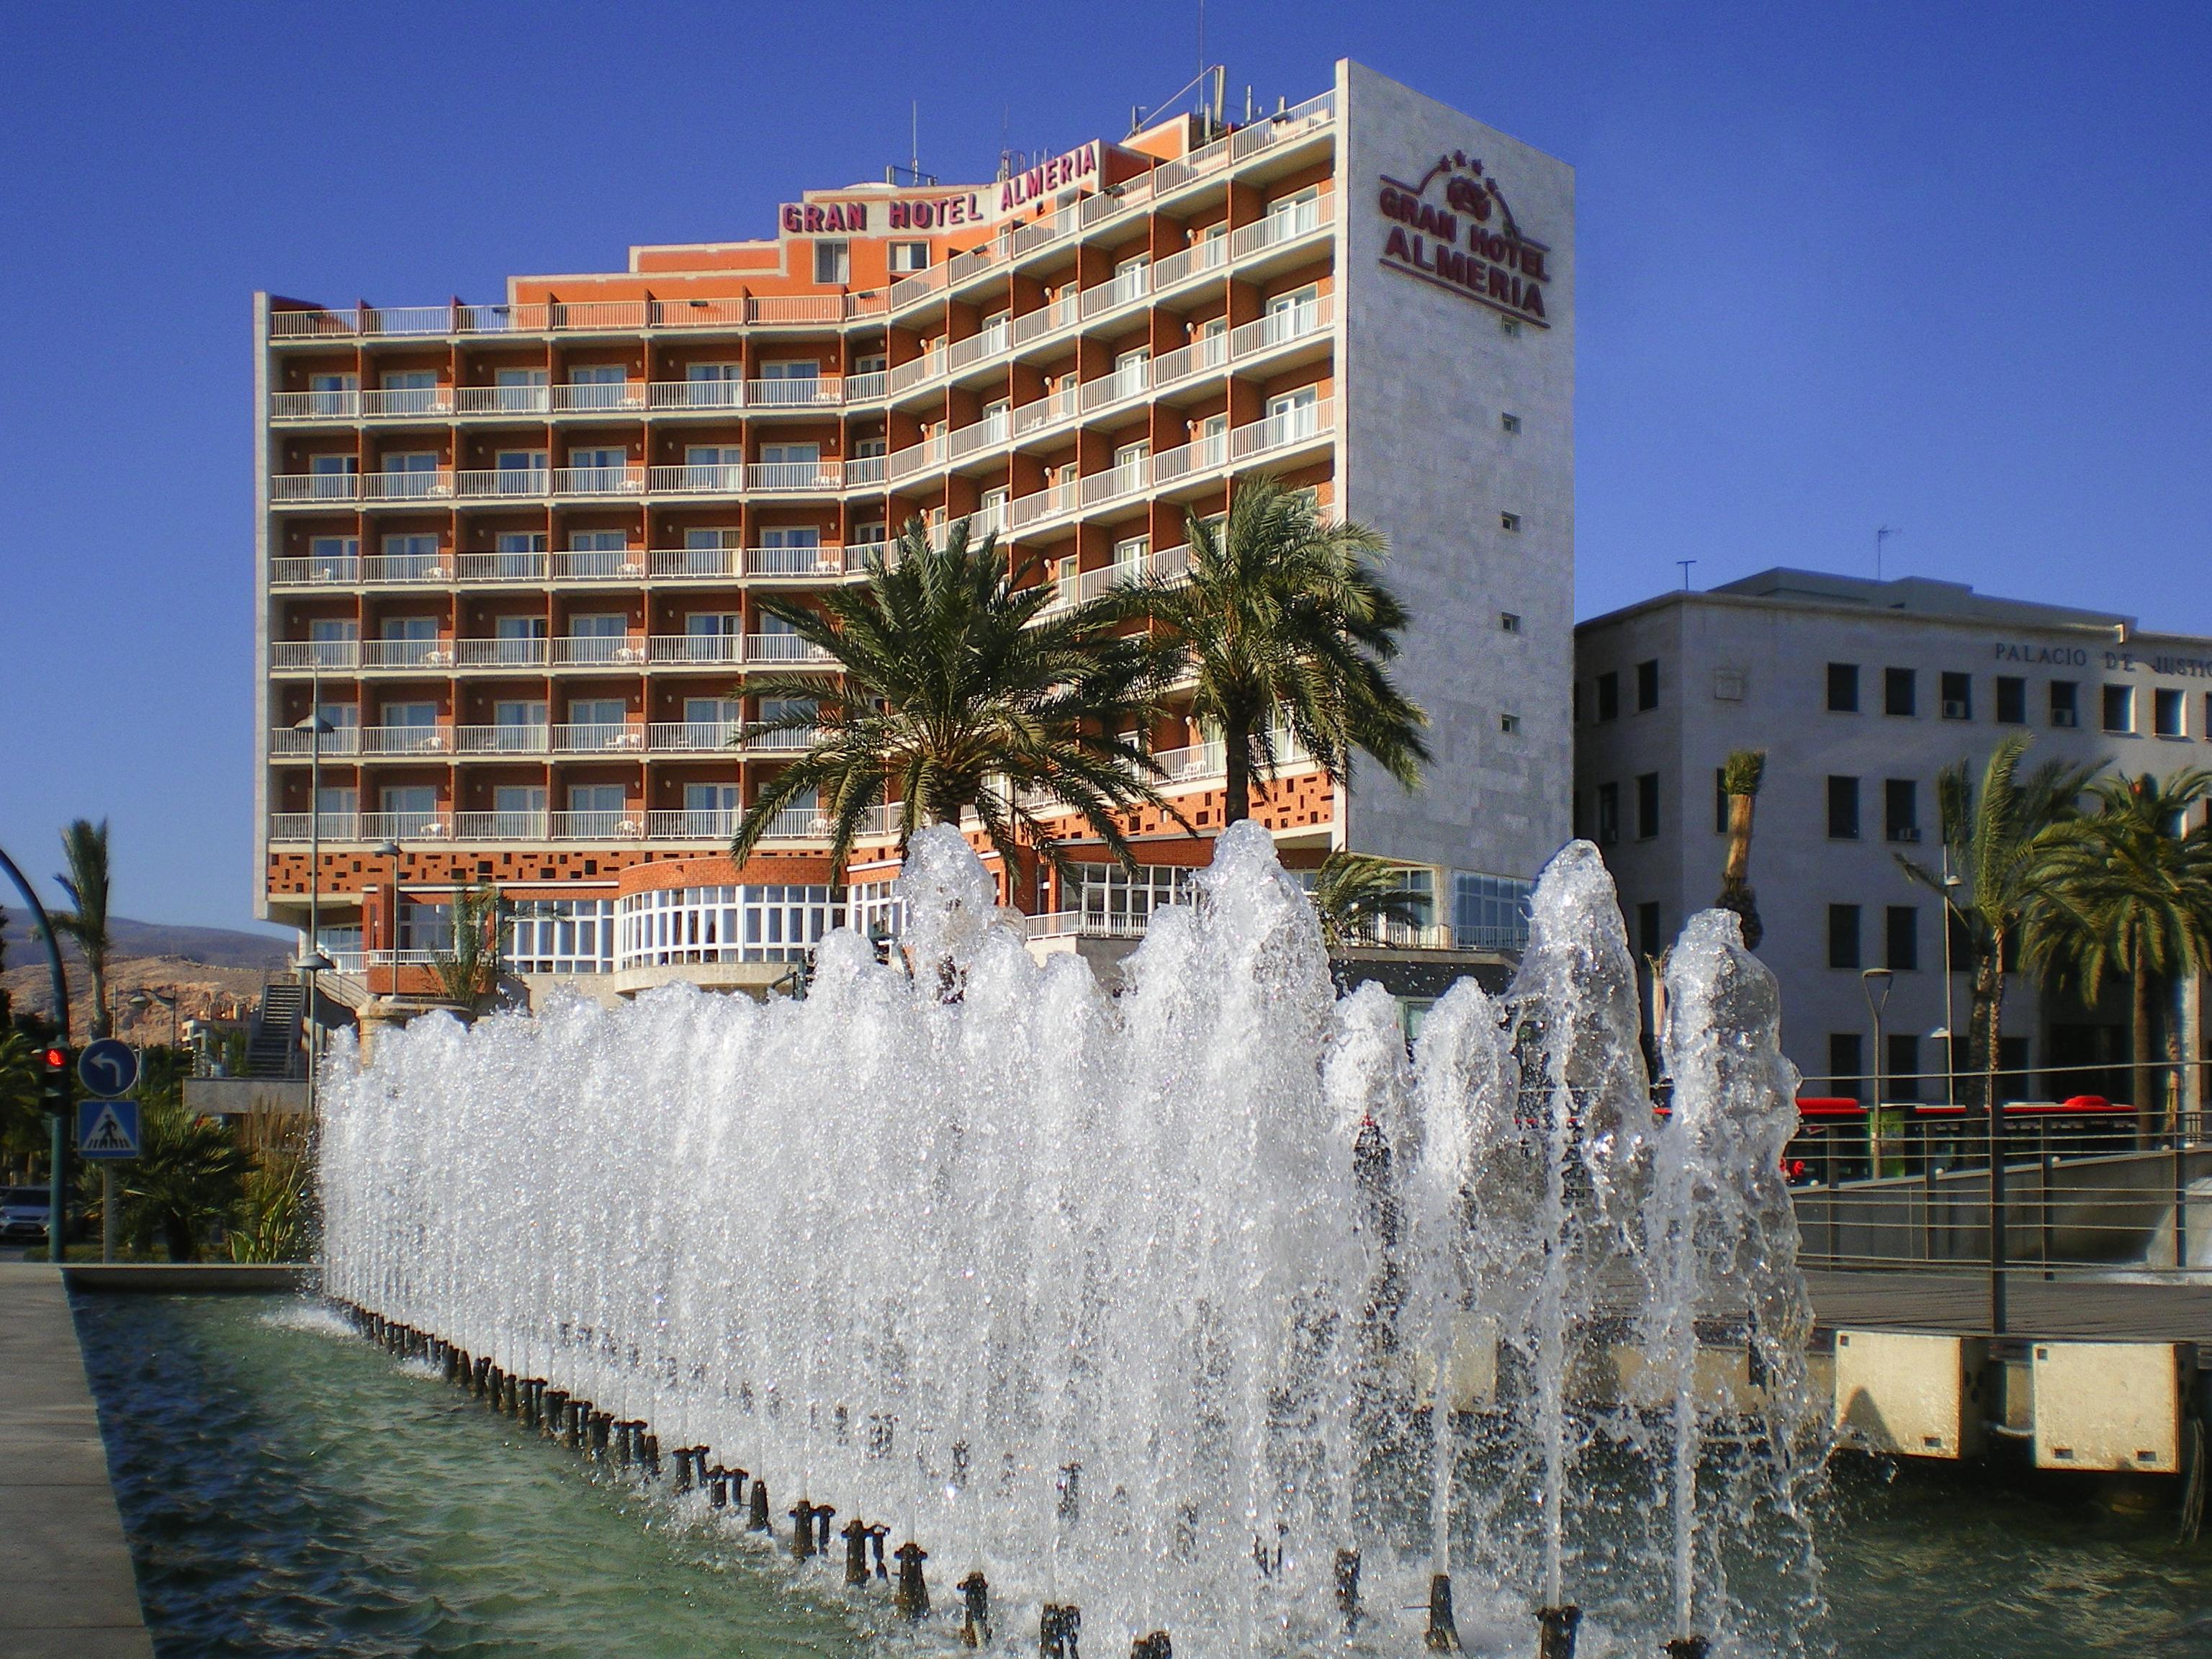 Grand Hotel Almeria Geschlossen